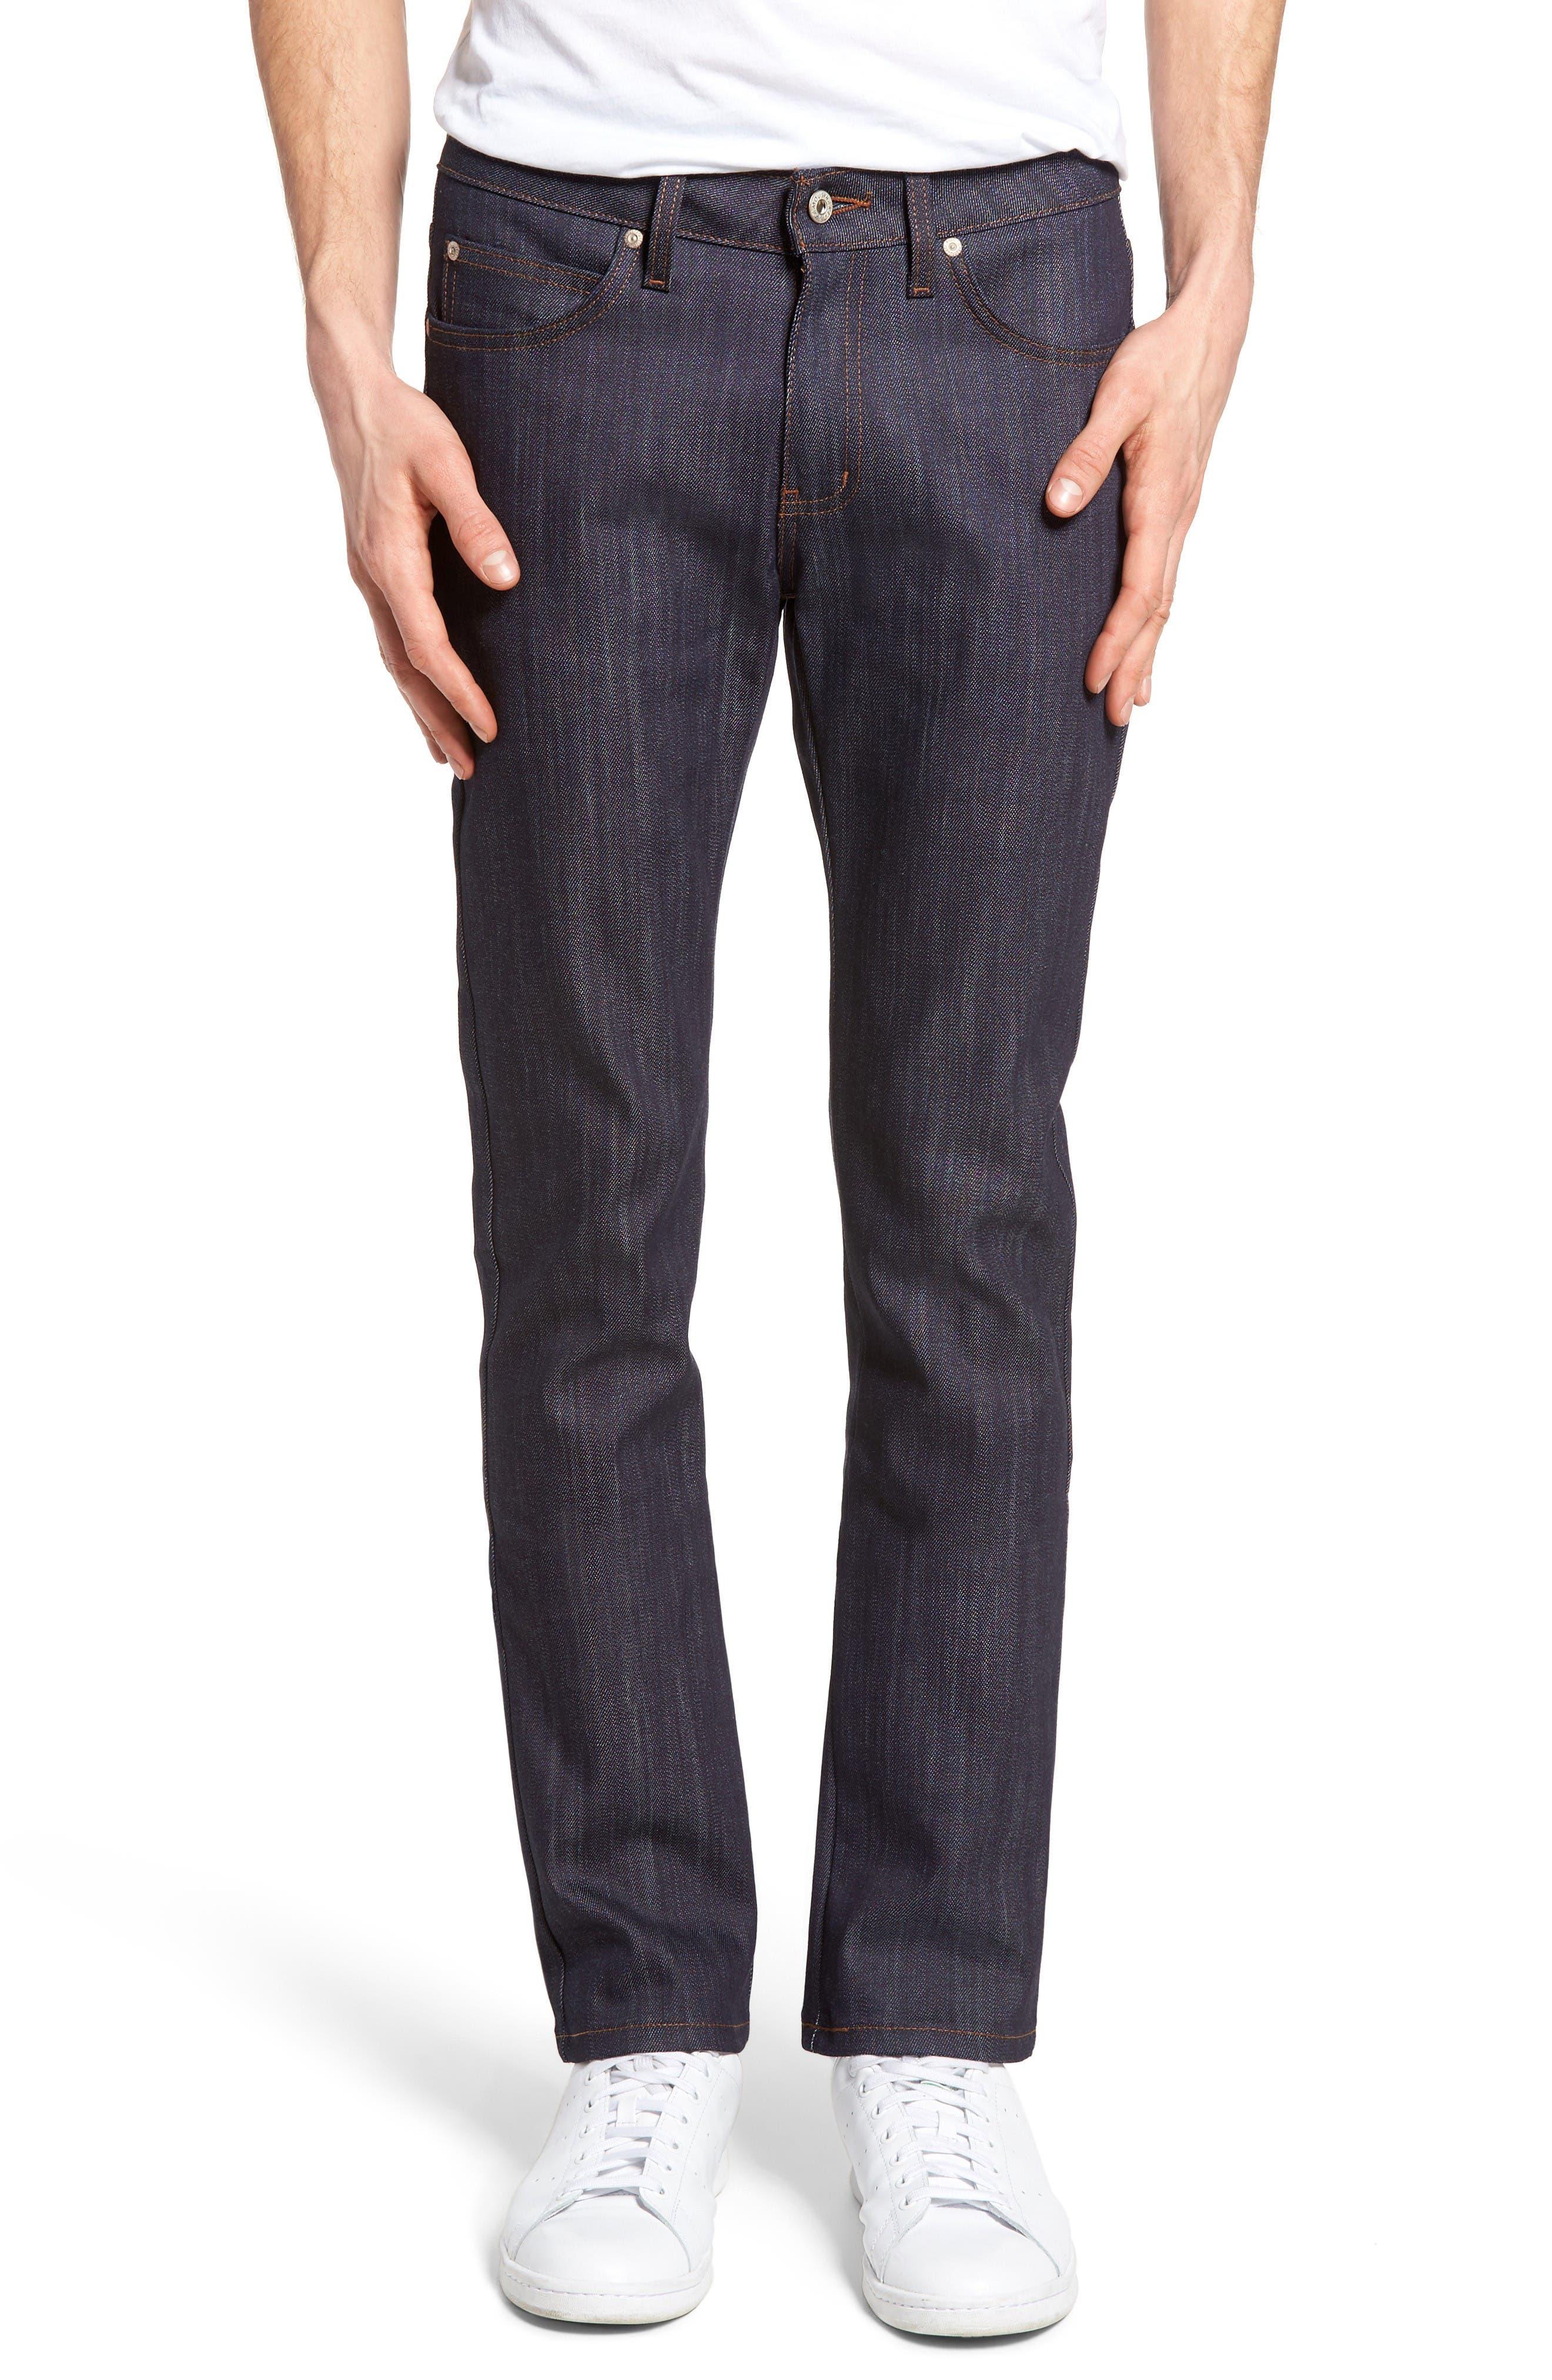 Naked & Famous Denim Skinny Guy Skinny Fit Power Stretch Jeans (Indigo)